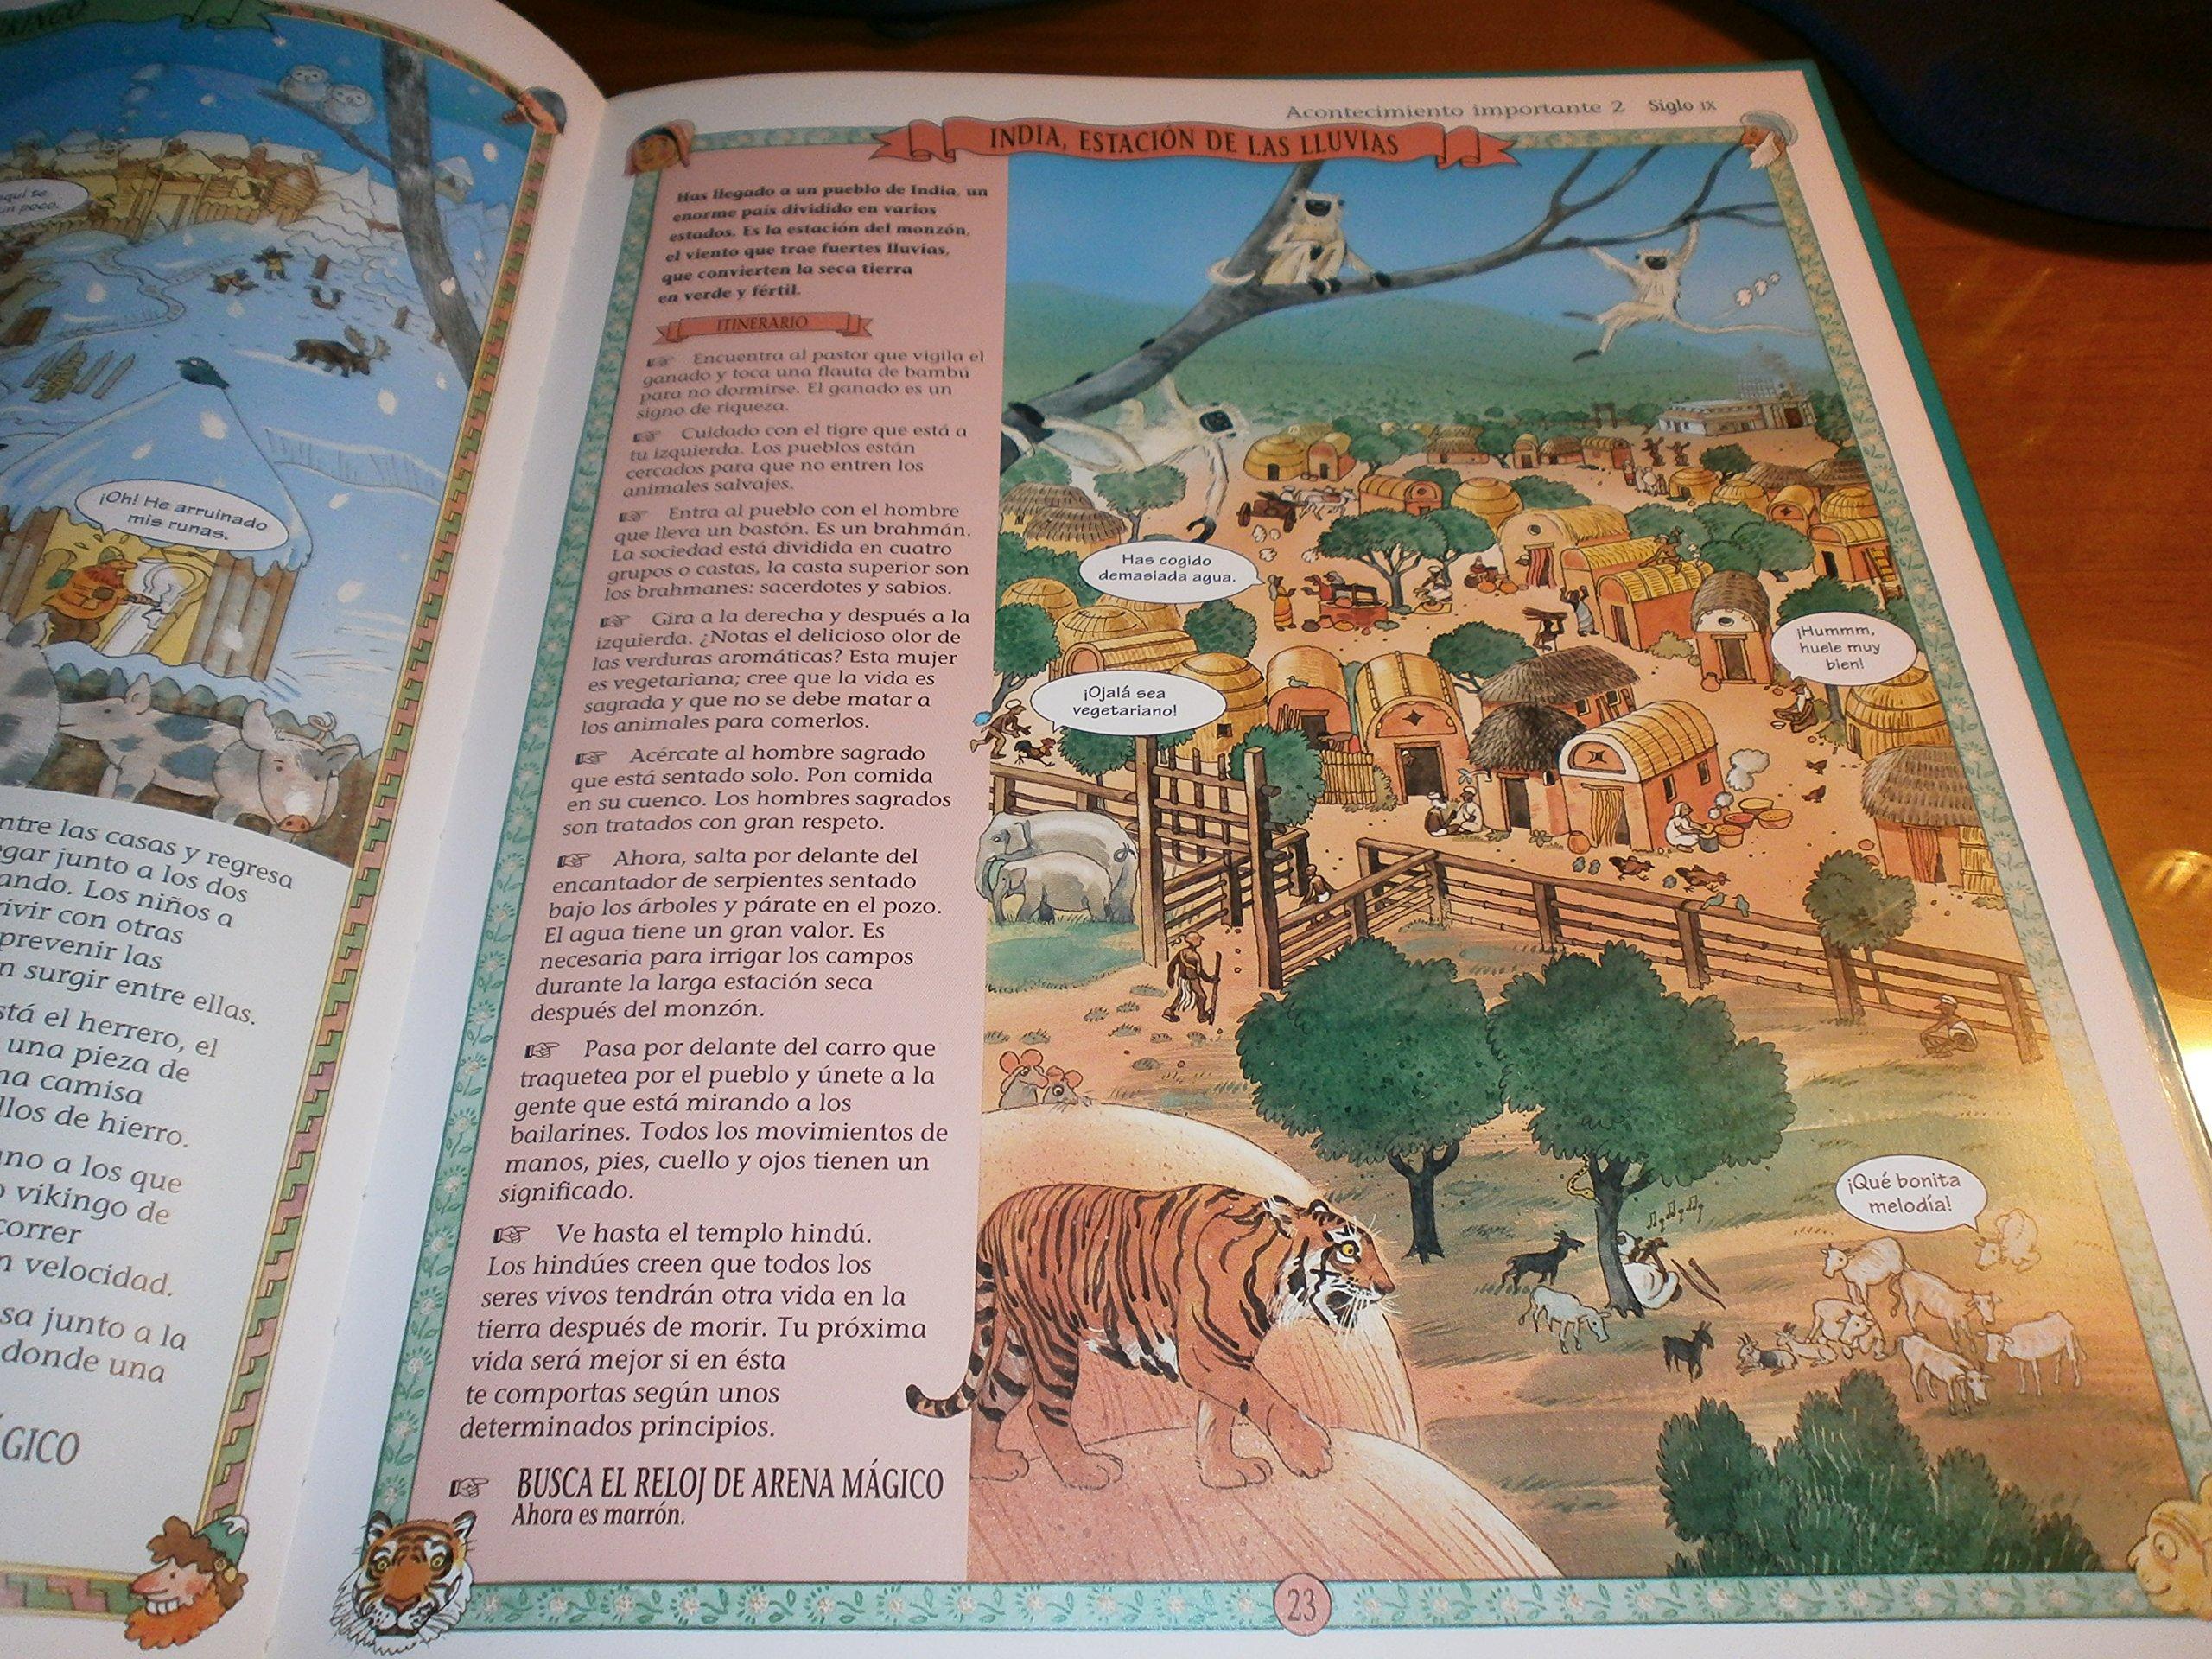 Reloj de Arena Magico, El (Spanish Edition): Joyce Maisner: 9788440647252: Amazon.com: Books